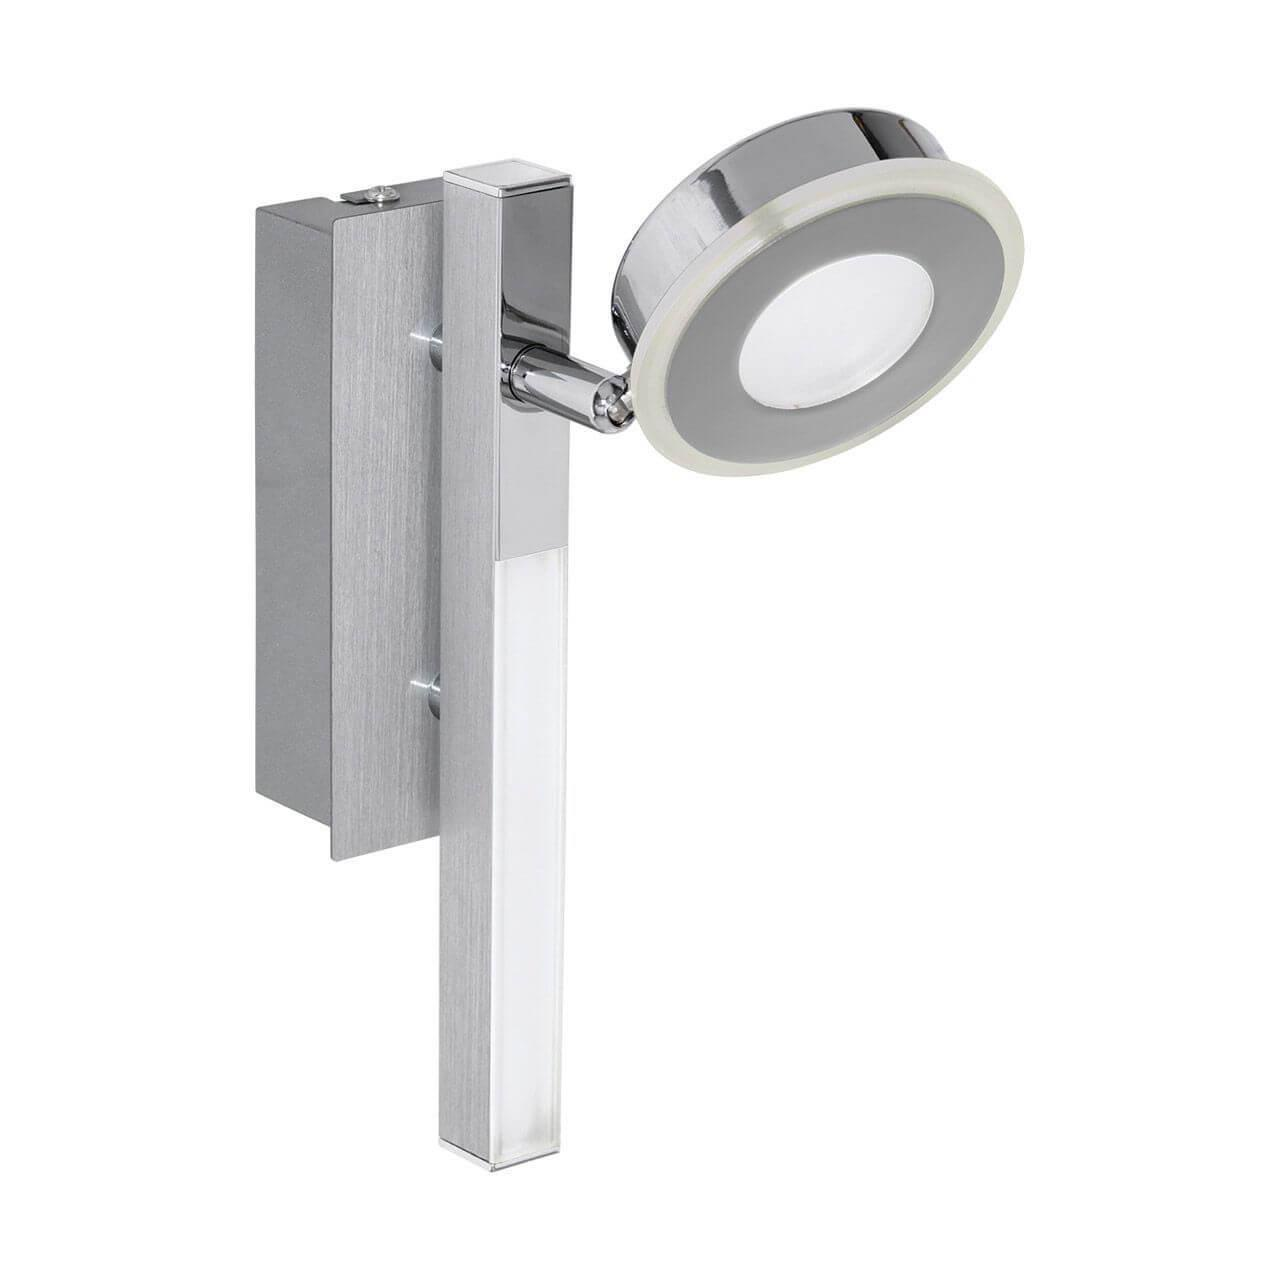 лучшая цена Спот Eglo 95996, LED, 3.3 Вт